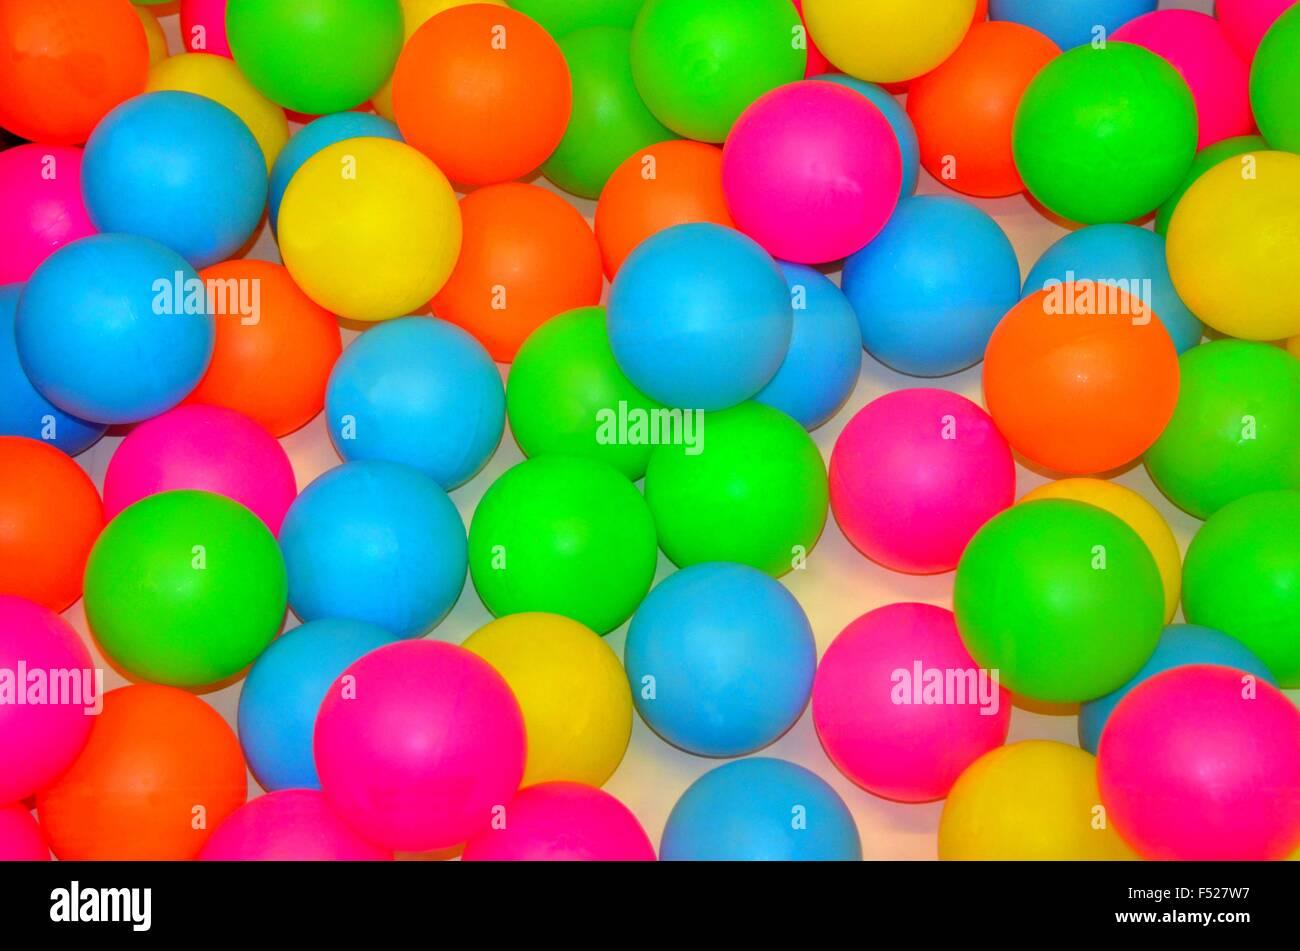 Vivid bright neon pink, orange, yellow, green and blue balls - Stock Image